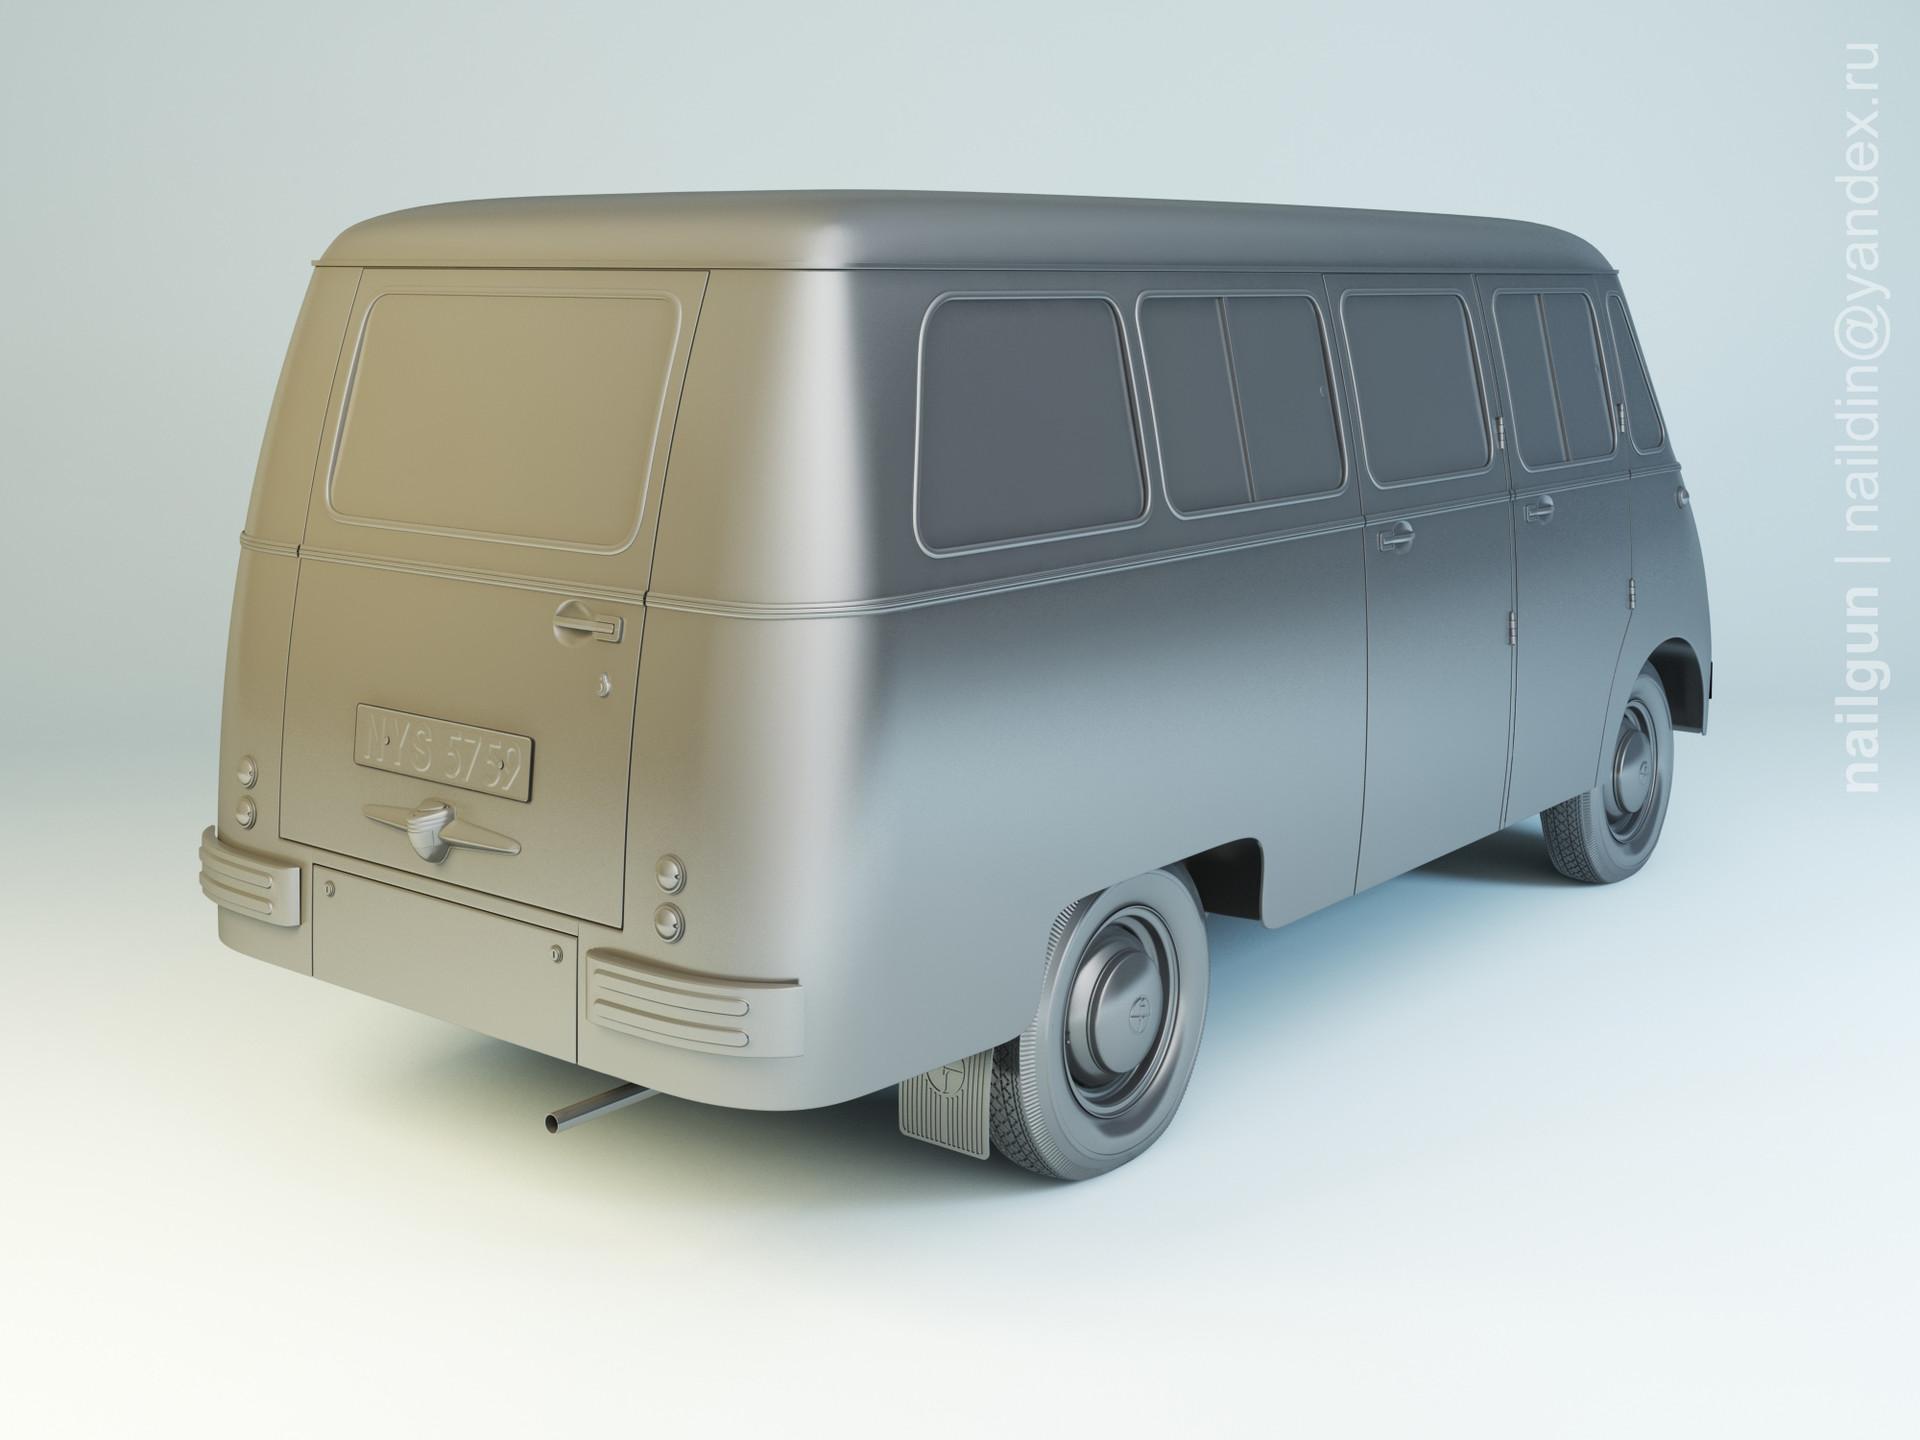 Nail khusnutdinov als 159 002 nysa n59 modelling 1